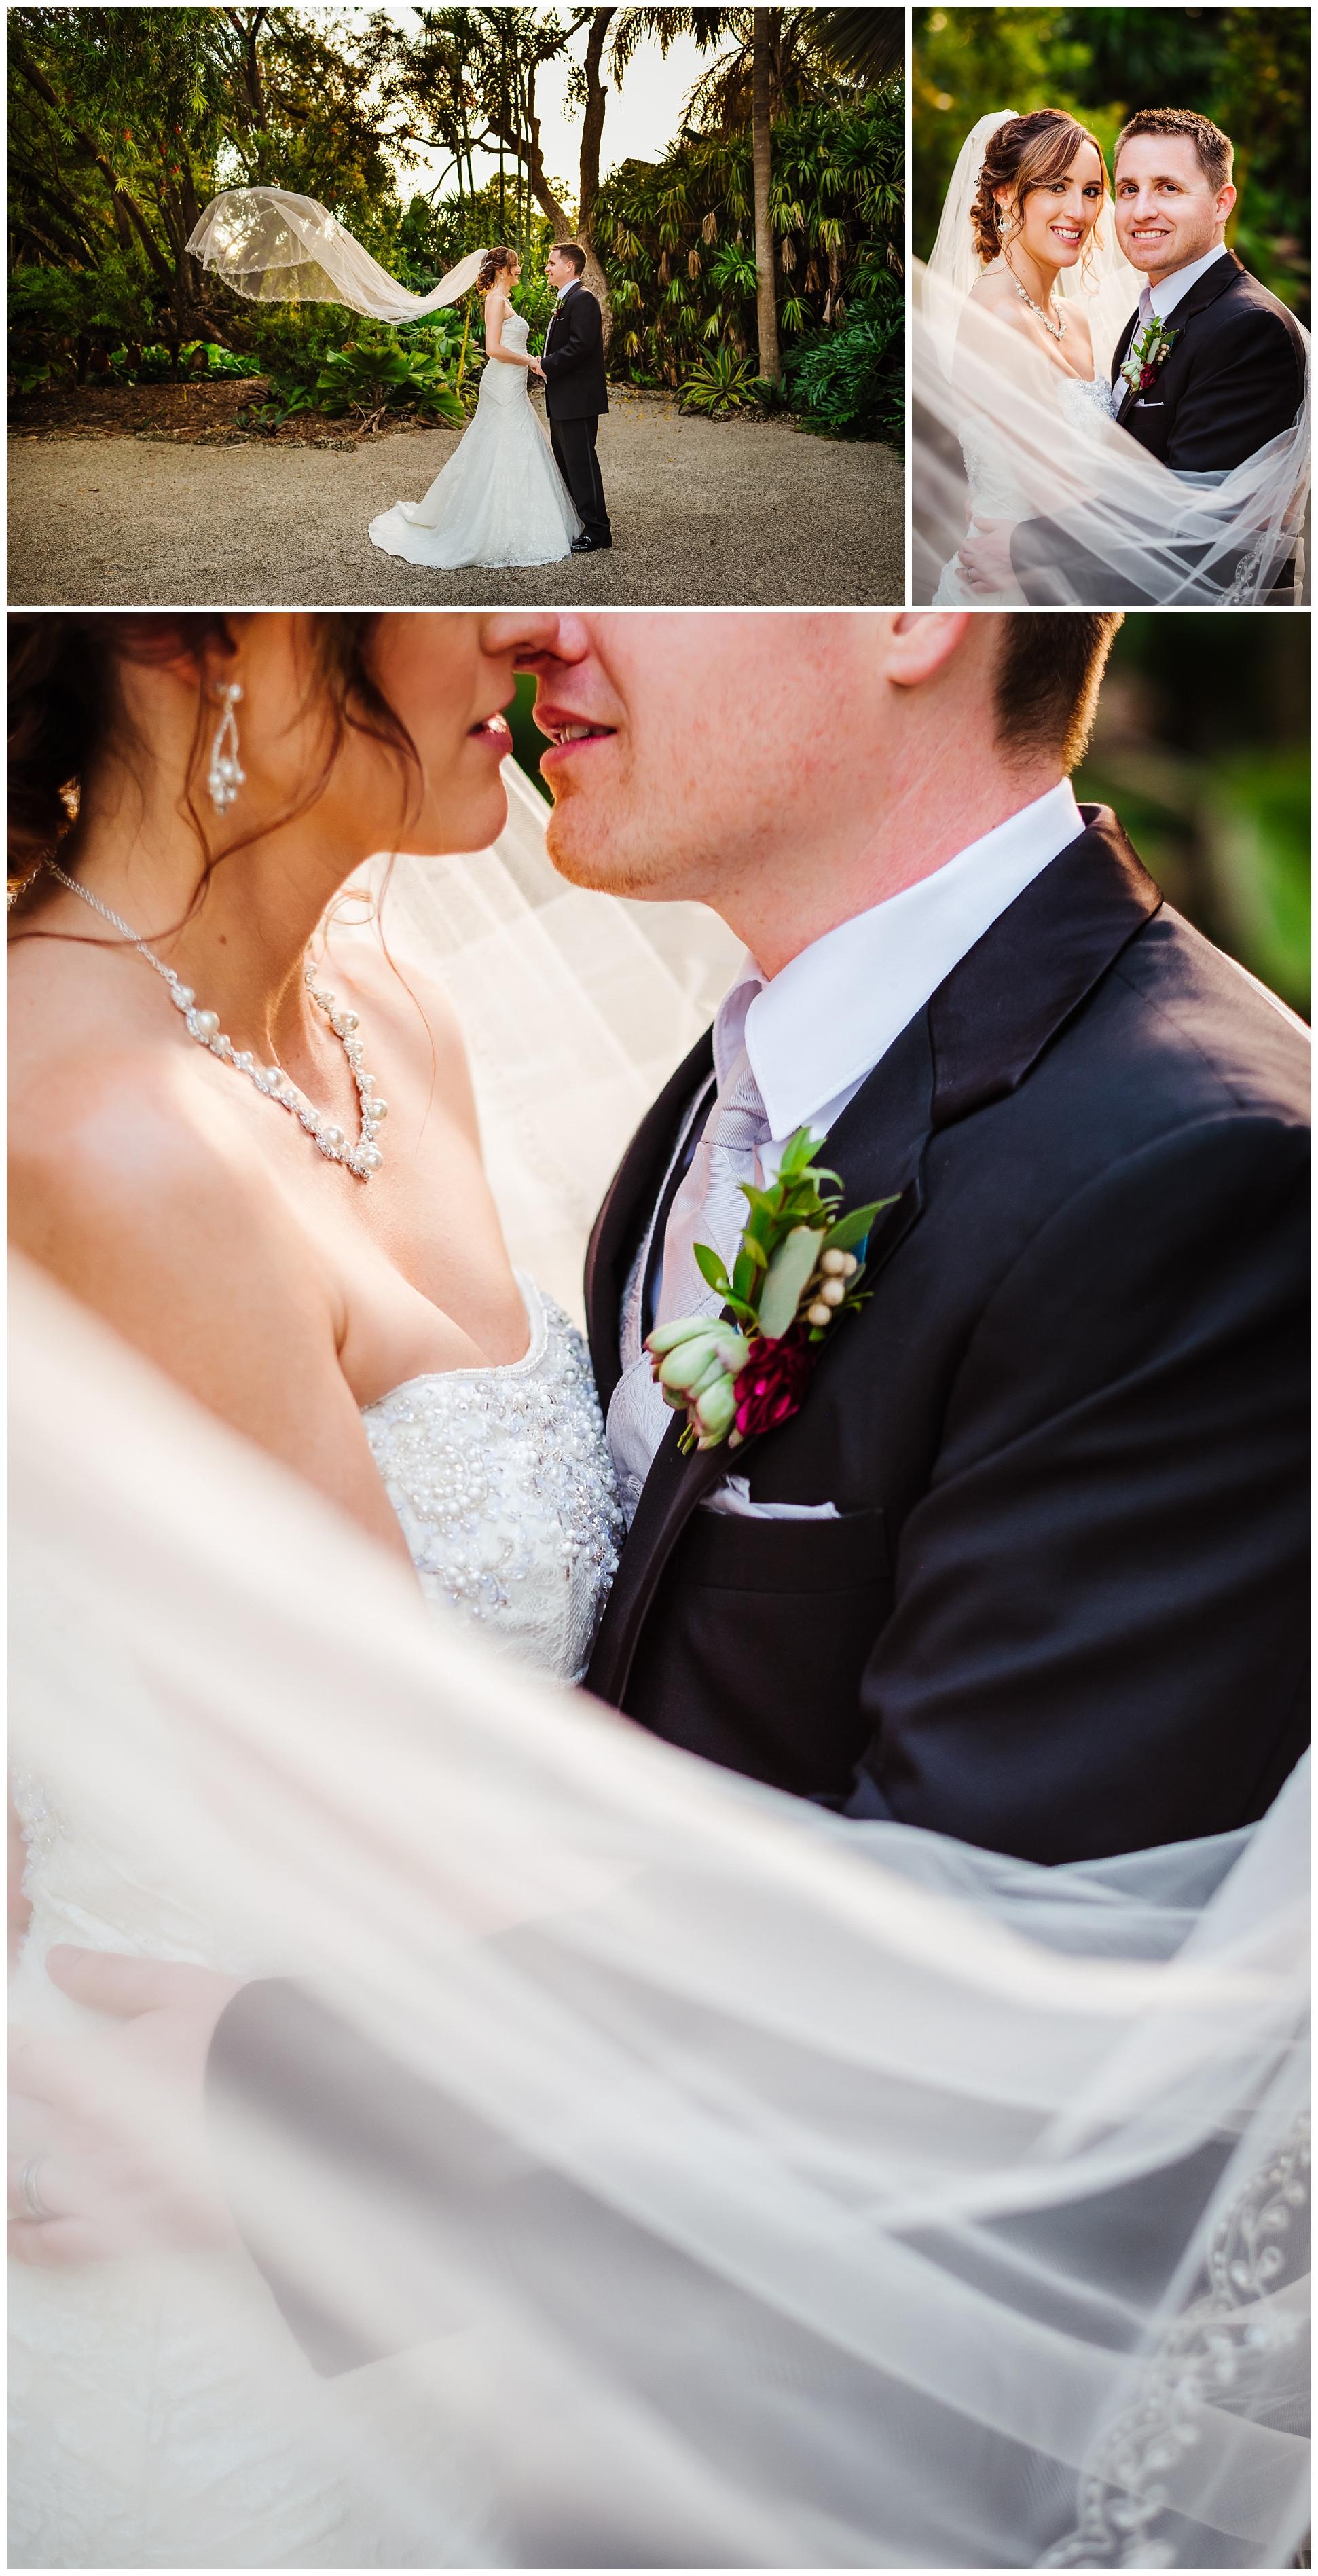 florida-destination-wedding-photographer-enchanted-tropical-miami-homestead-cooper-estate-teal_0063.jpg